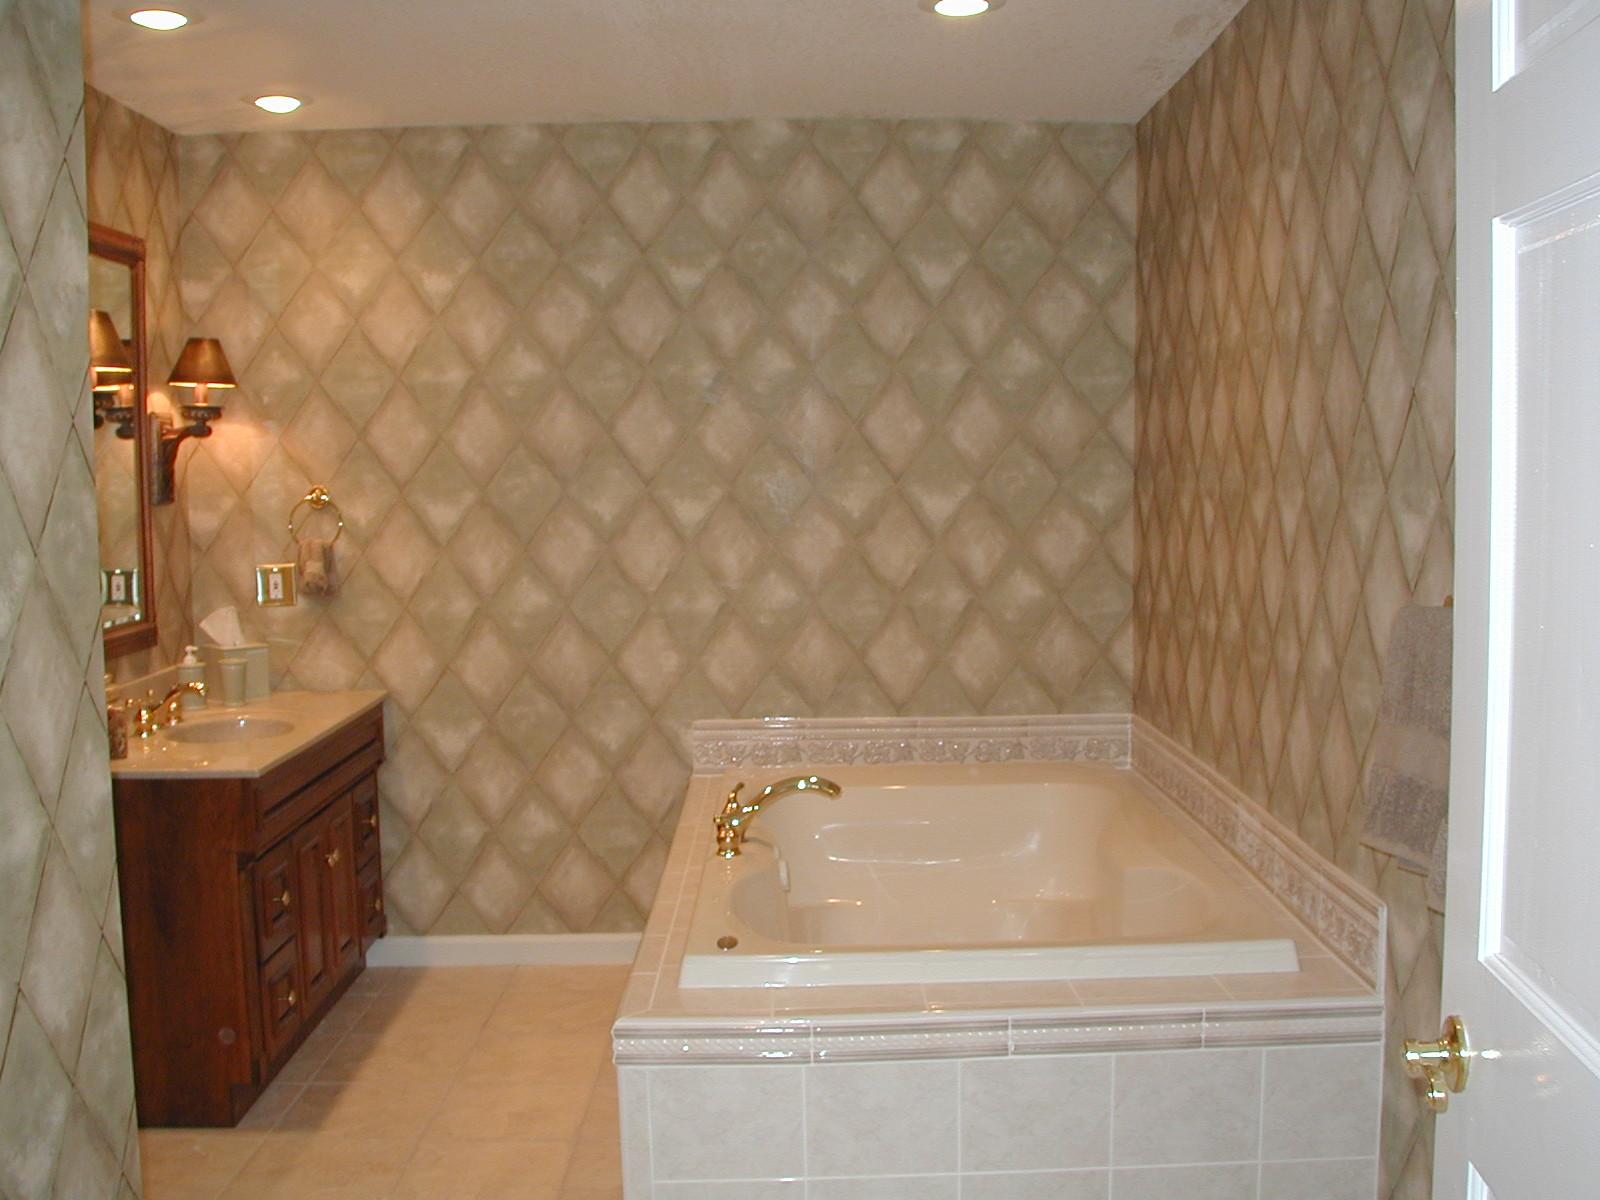 Astonishing Bathtub Shower Tile Ideas Wood Tile Tub Shower Surround Bathroom Largest Home Design Picture Inspirations Pitcheantrous